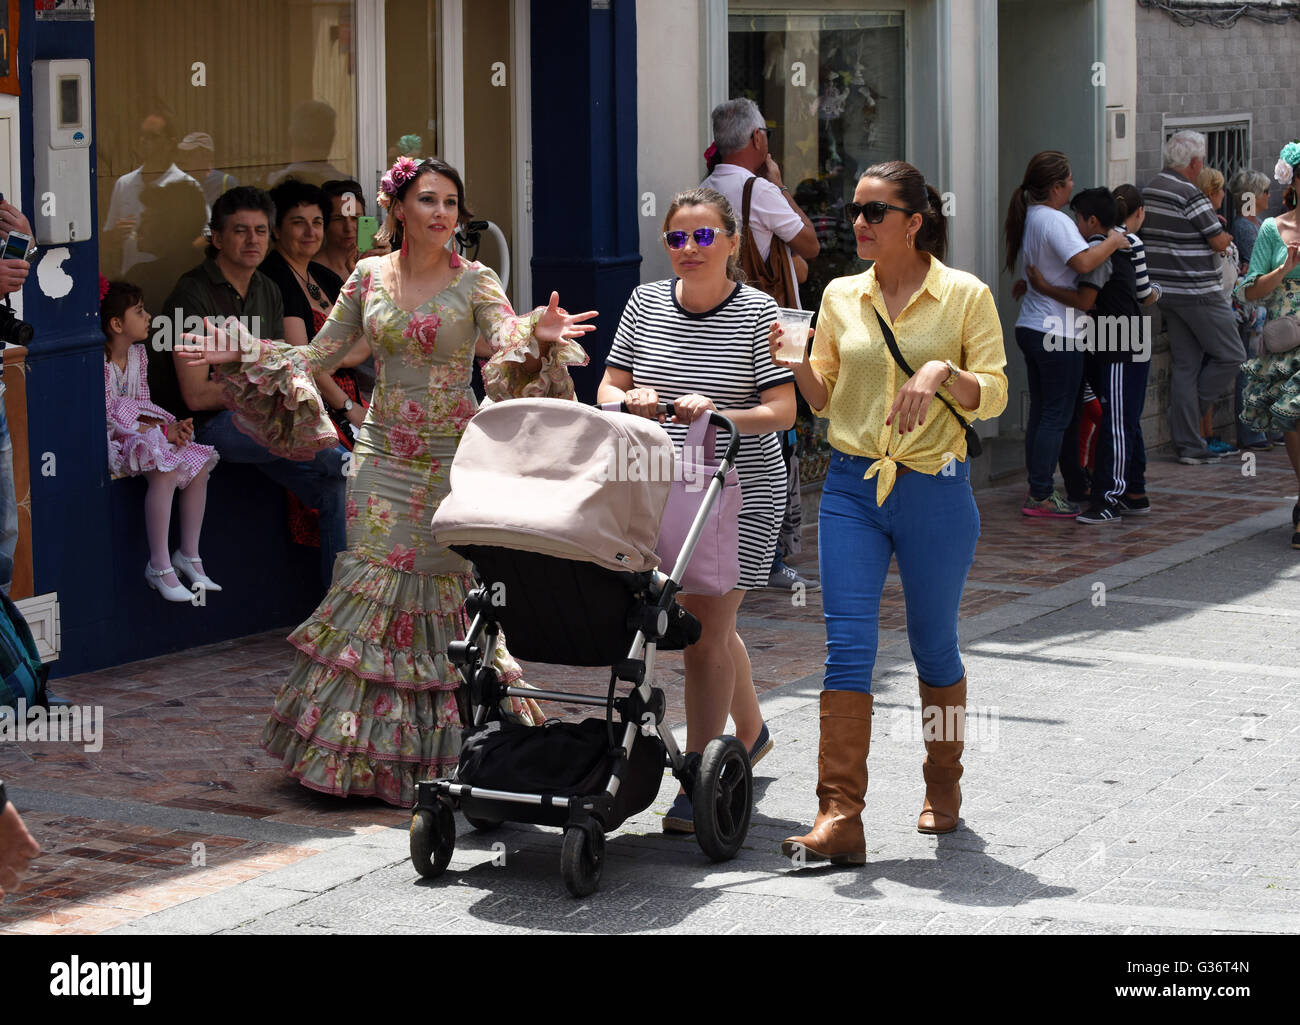 Attraktive Frauen, gekleidet in traditioneller Tracht bei San Isidro Festival Fiesta in Nerja Andalucia Spanien Stockbild